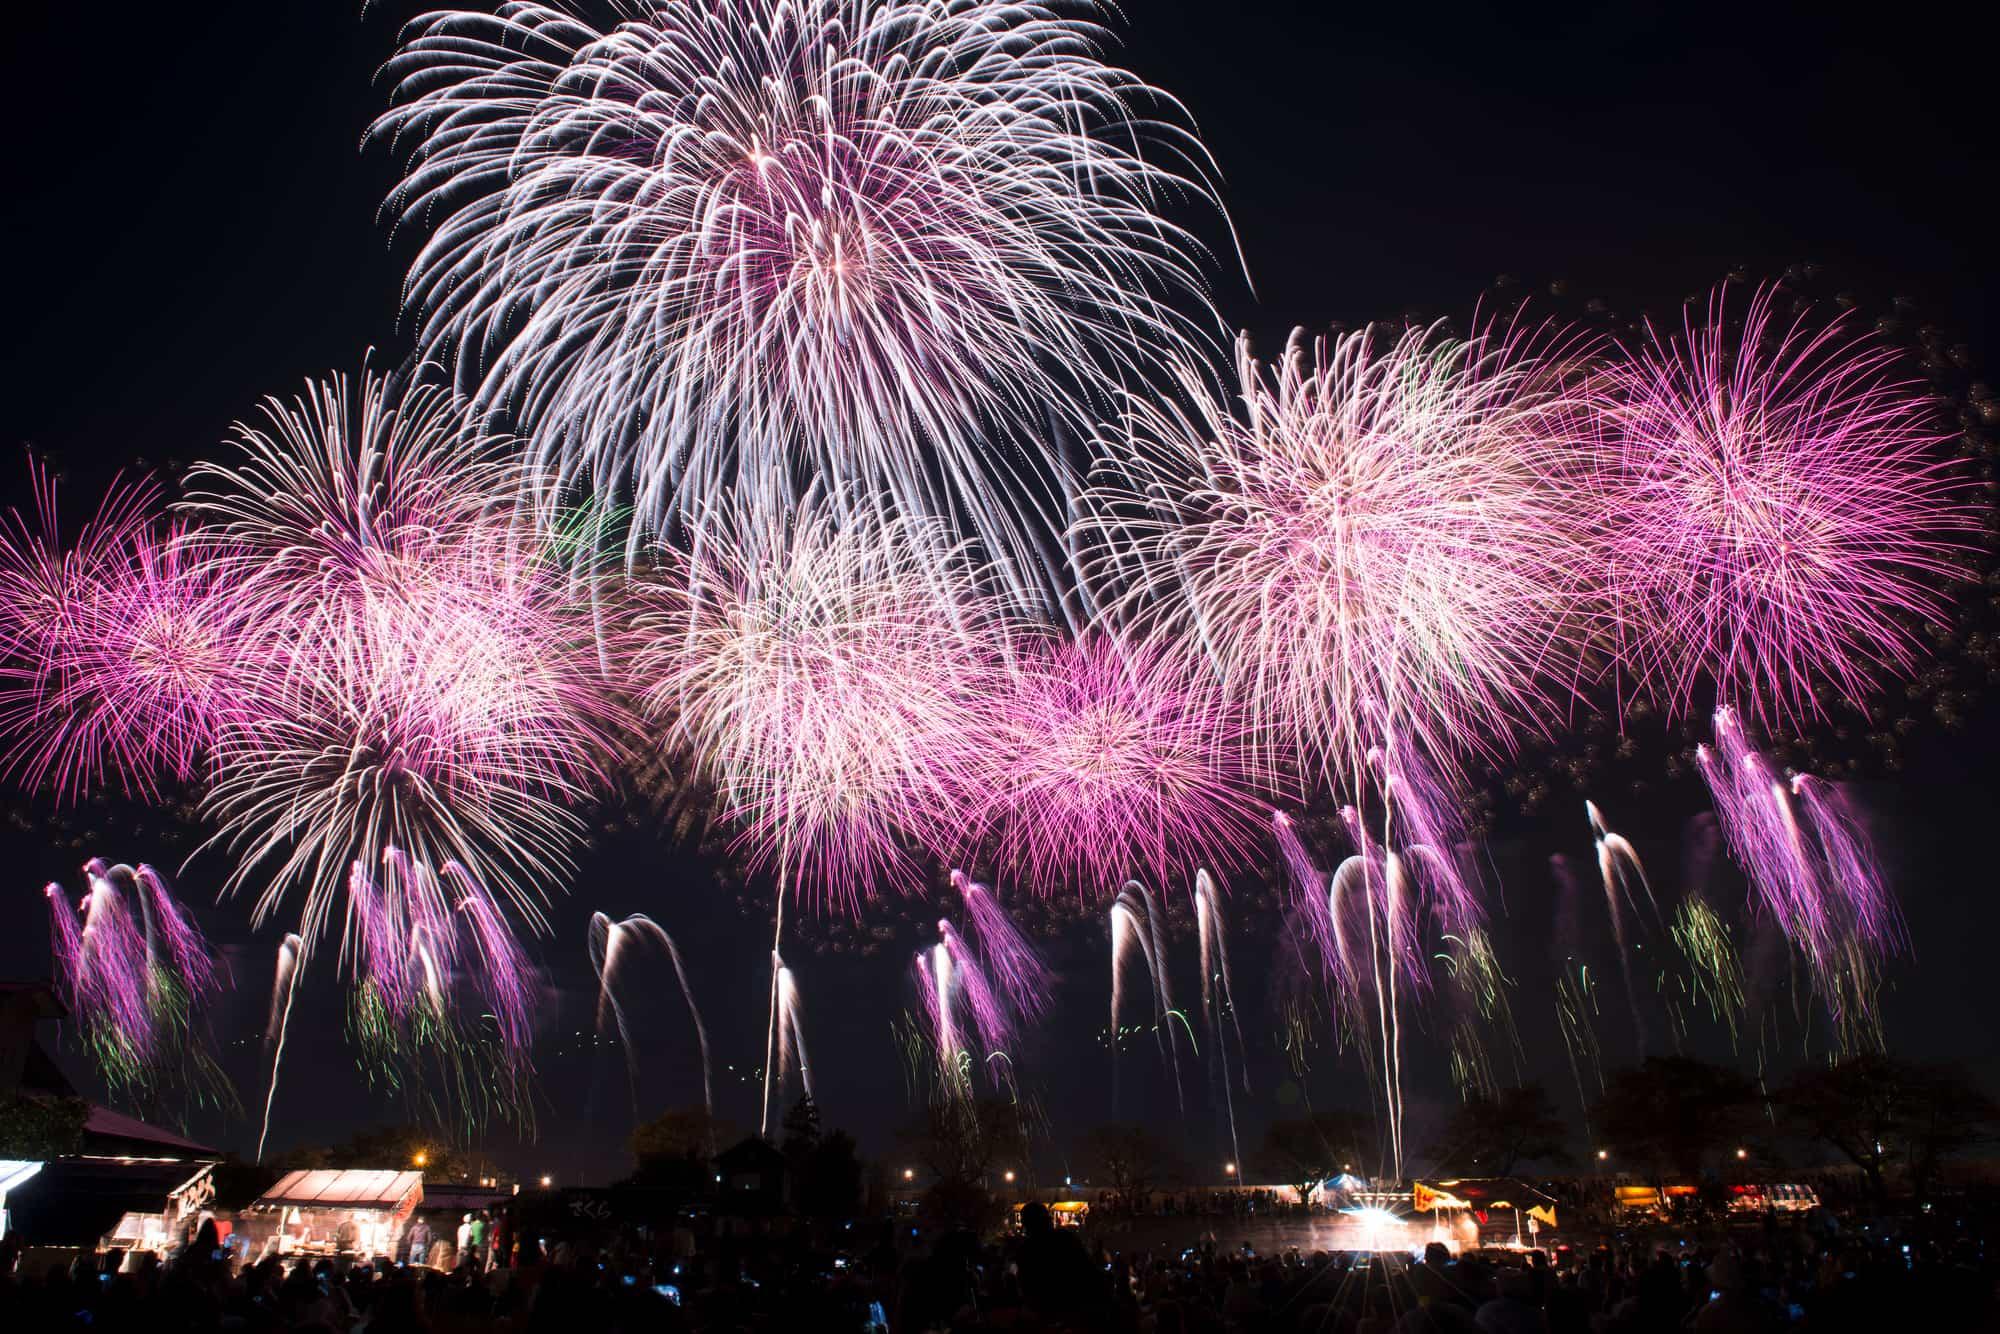 Pemandangan Kompetisi Kembang Api Jepang Tsuchiura